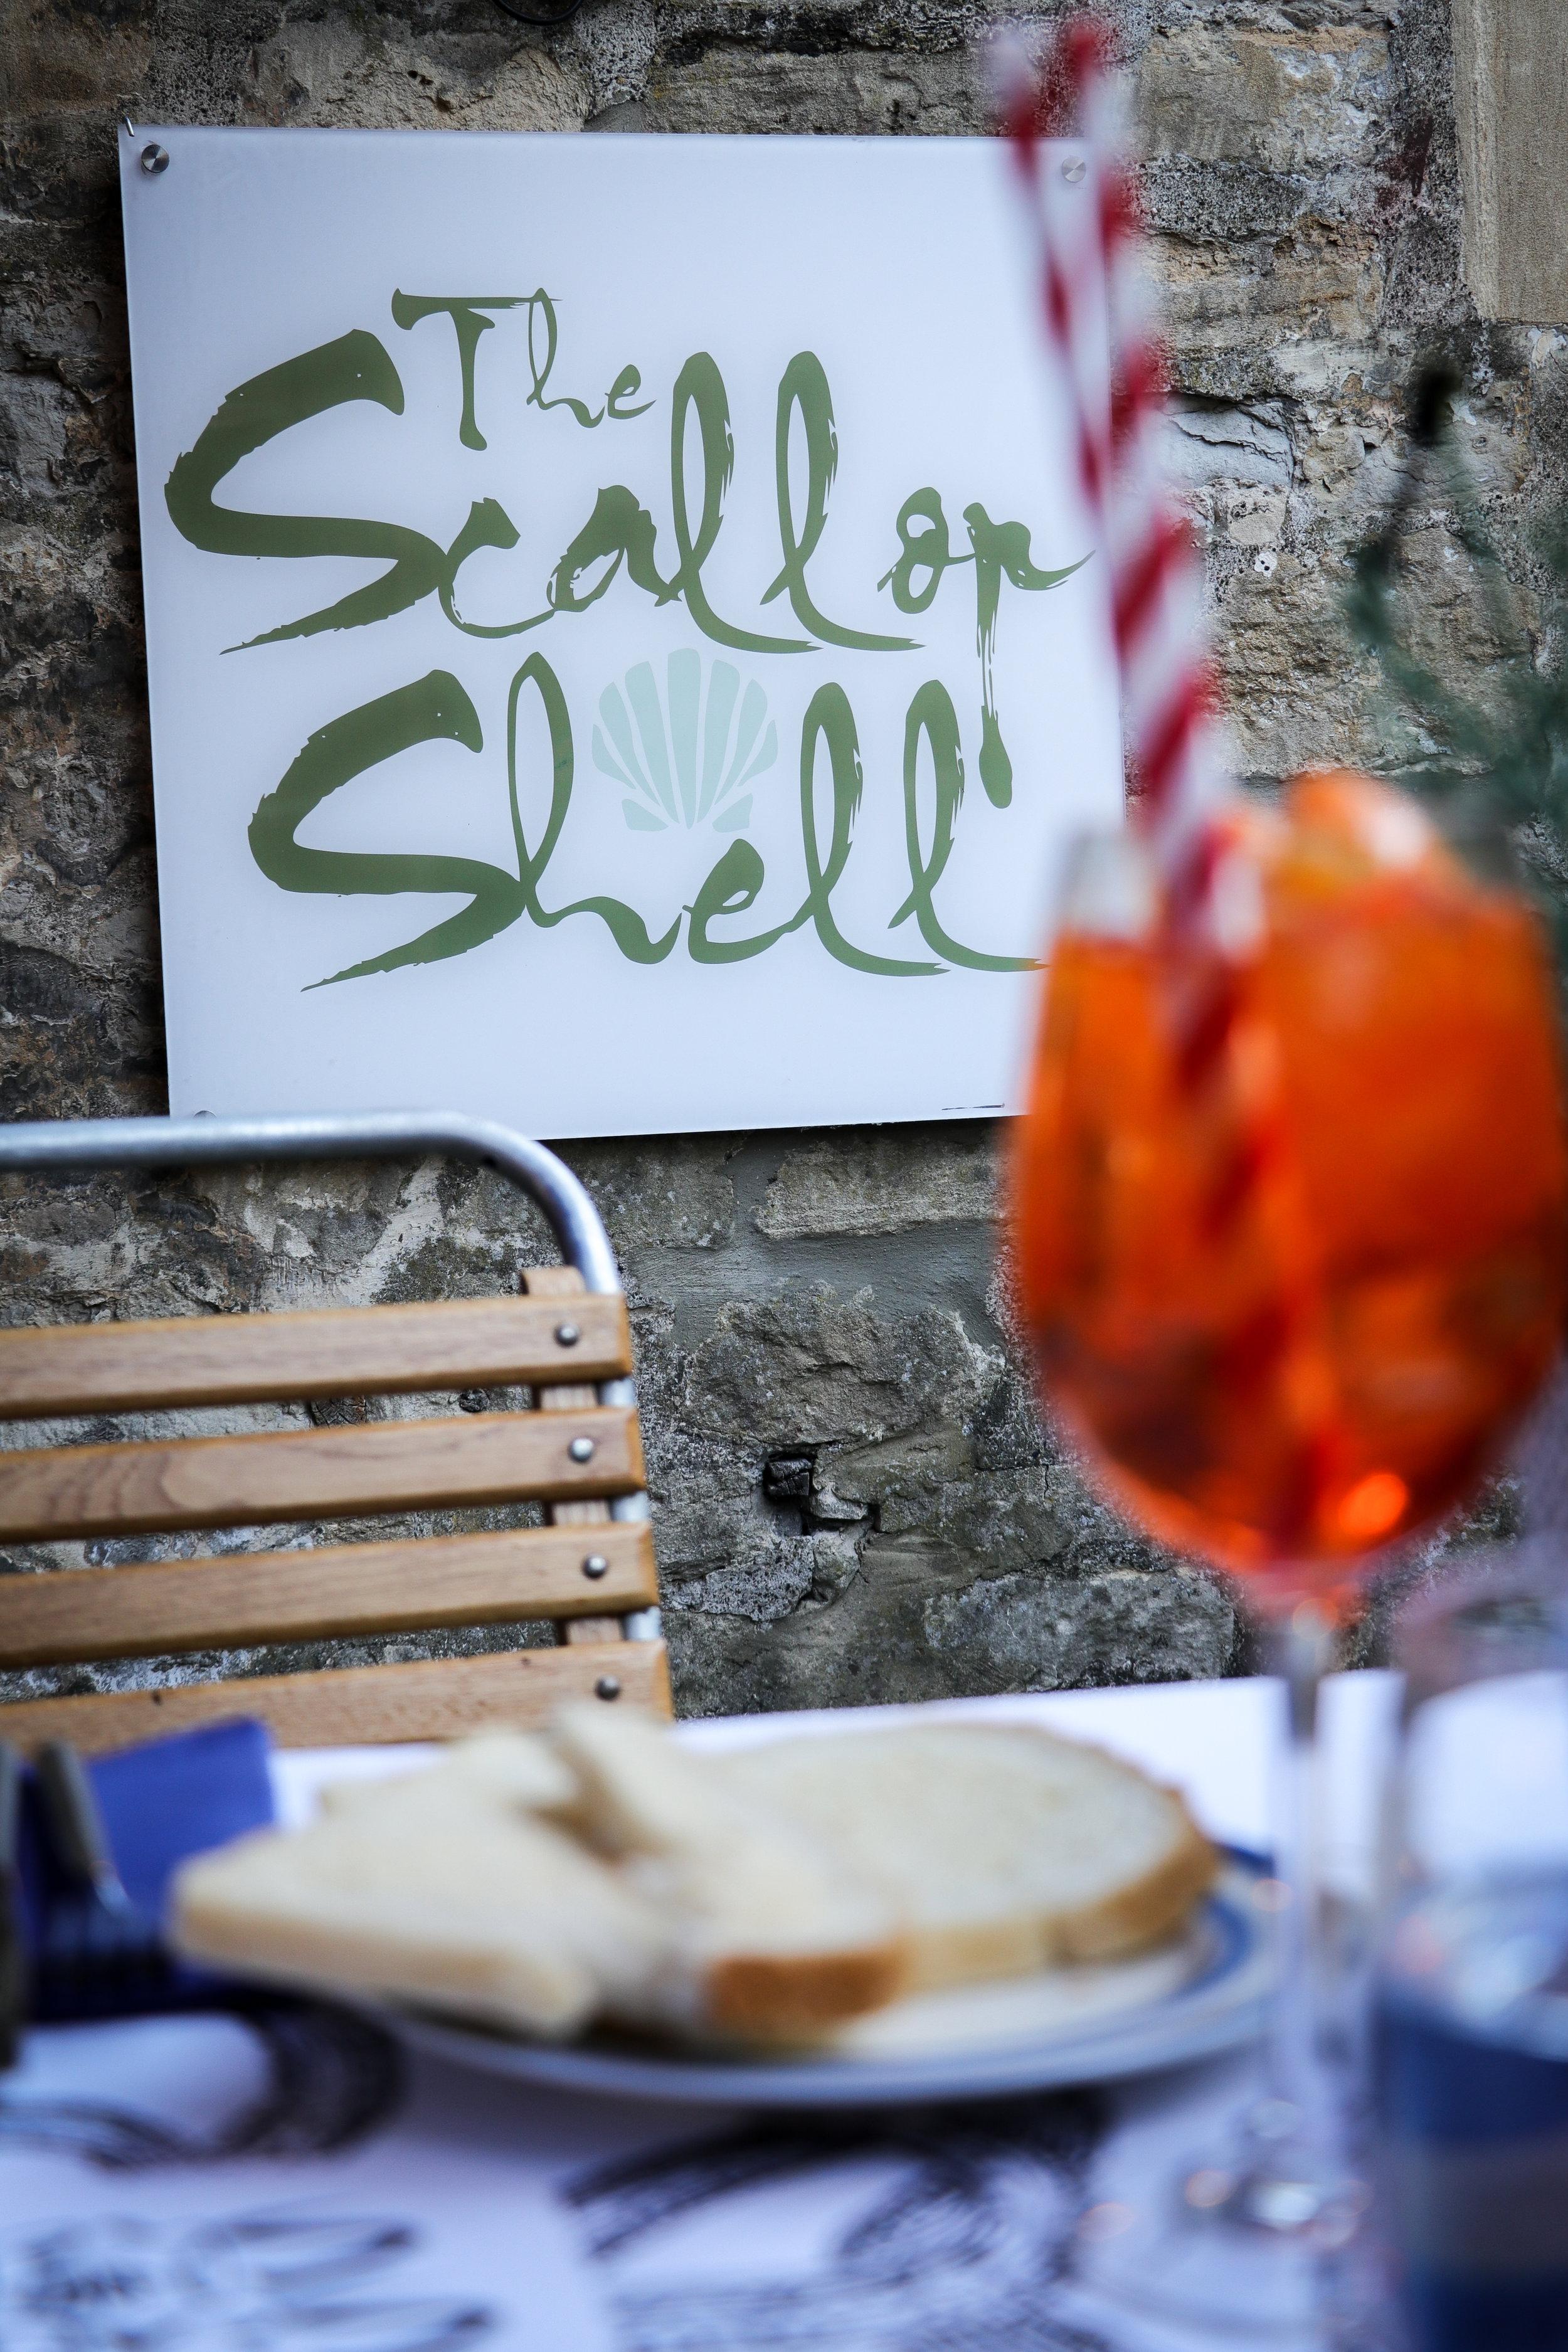 The Scallop Shell - Bath.jpg